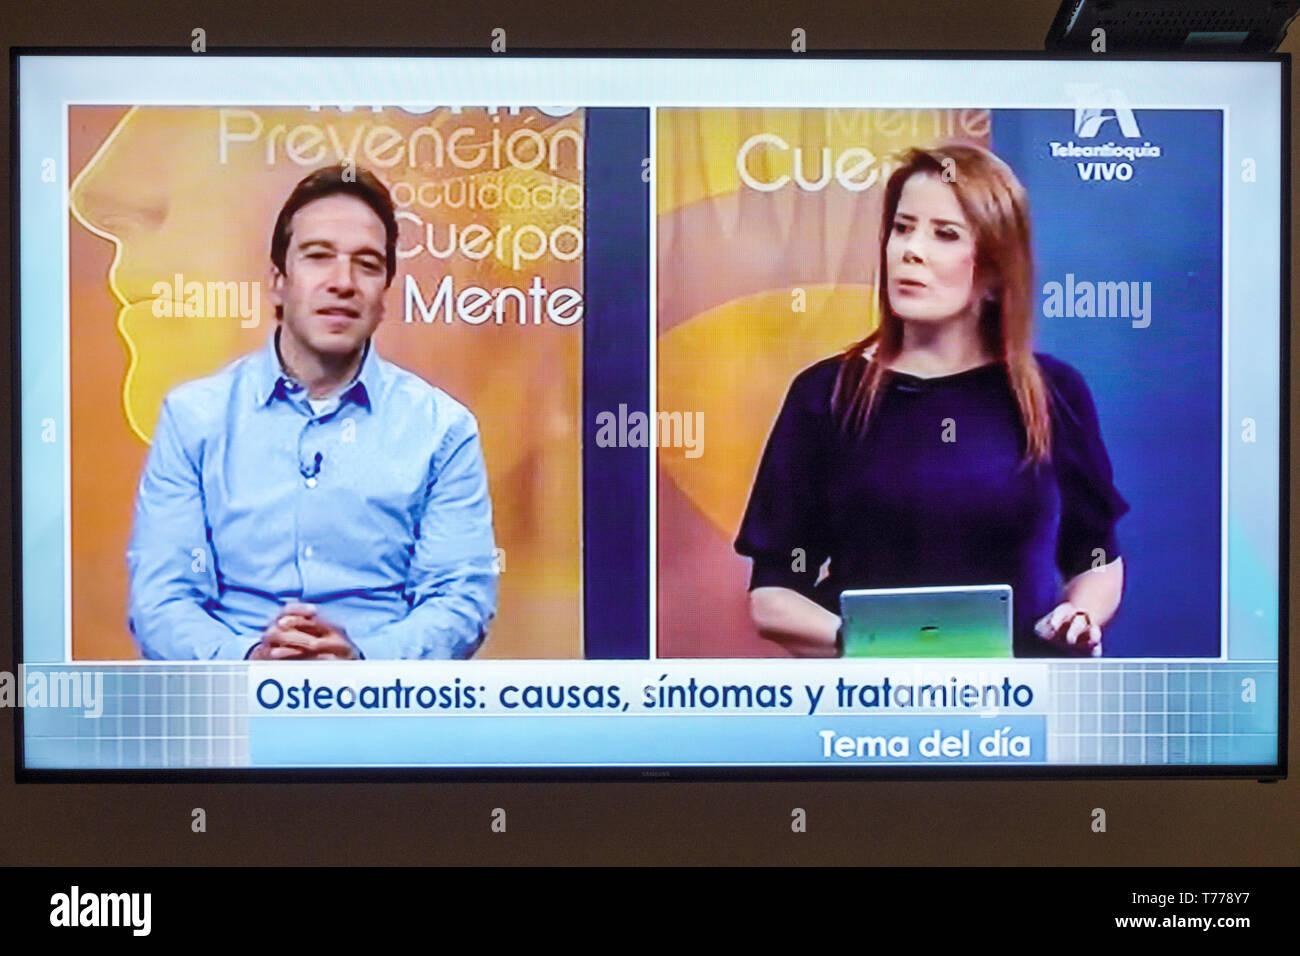 Cartagena Colombia TV television monitor screen flat screen medical program Spanish language osteoarthritis telemarketing Hispanic woman man - Stock Image